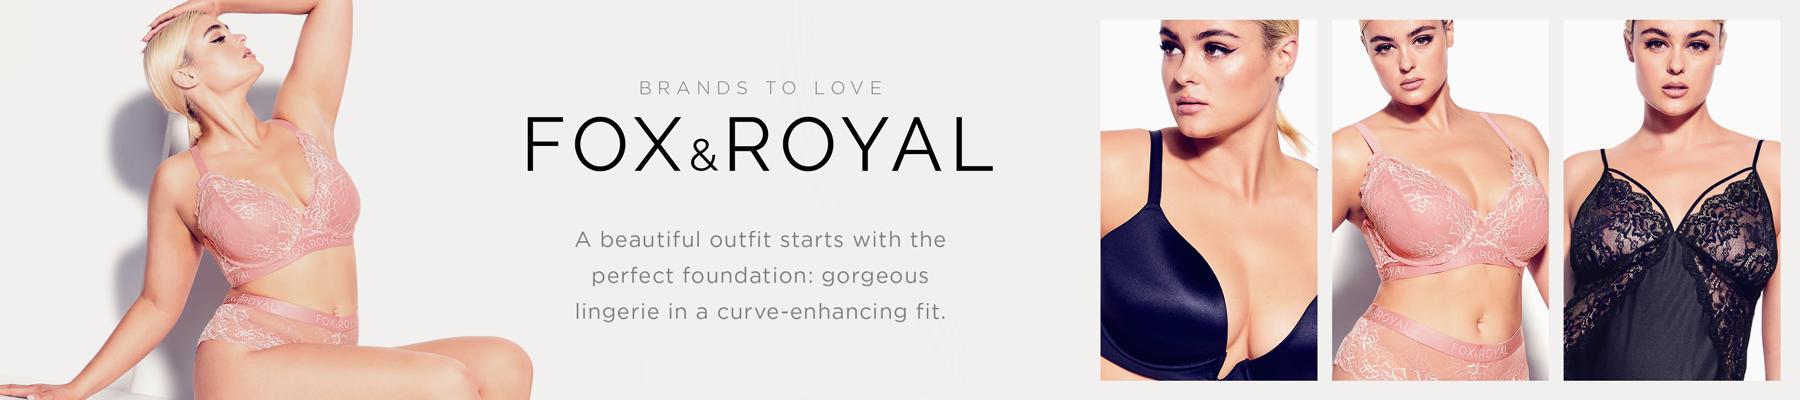 Fox & Royal Lingerie - Brands to Love